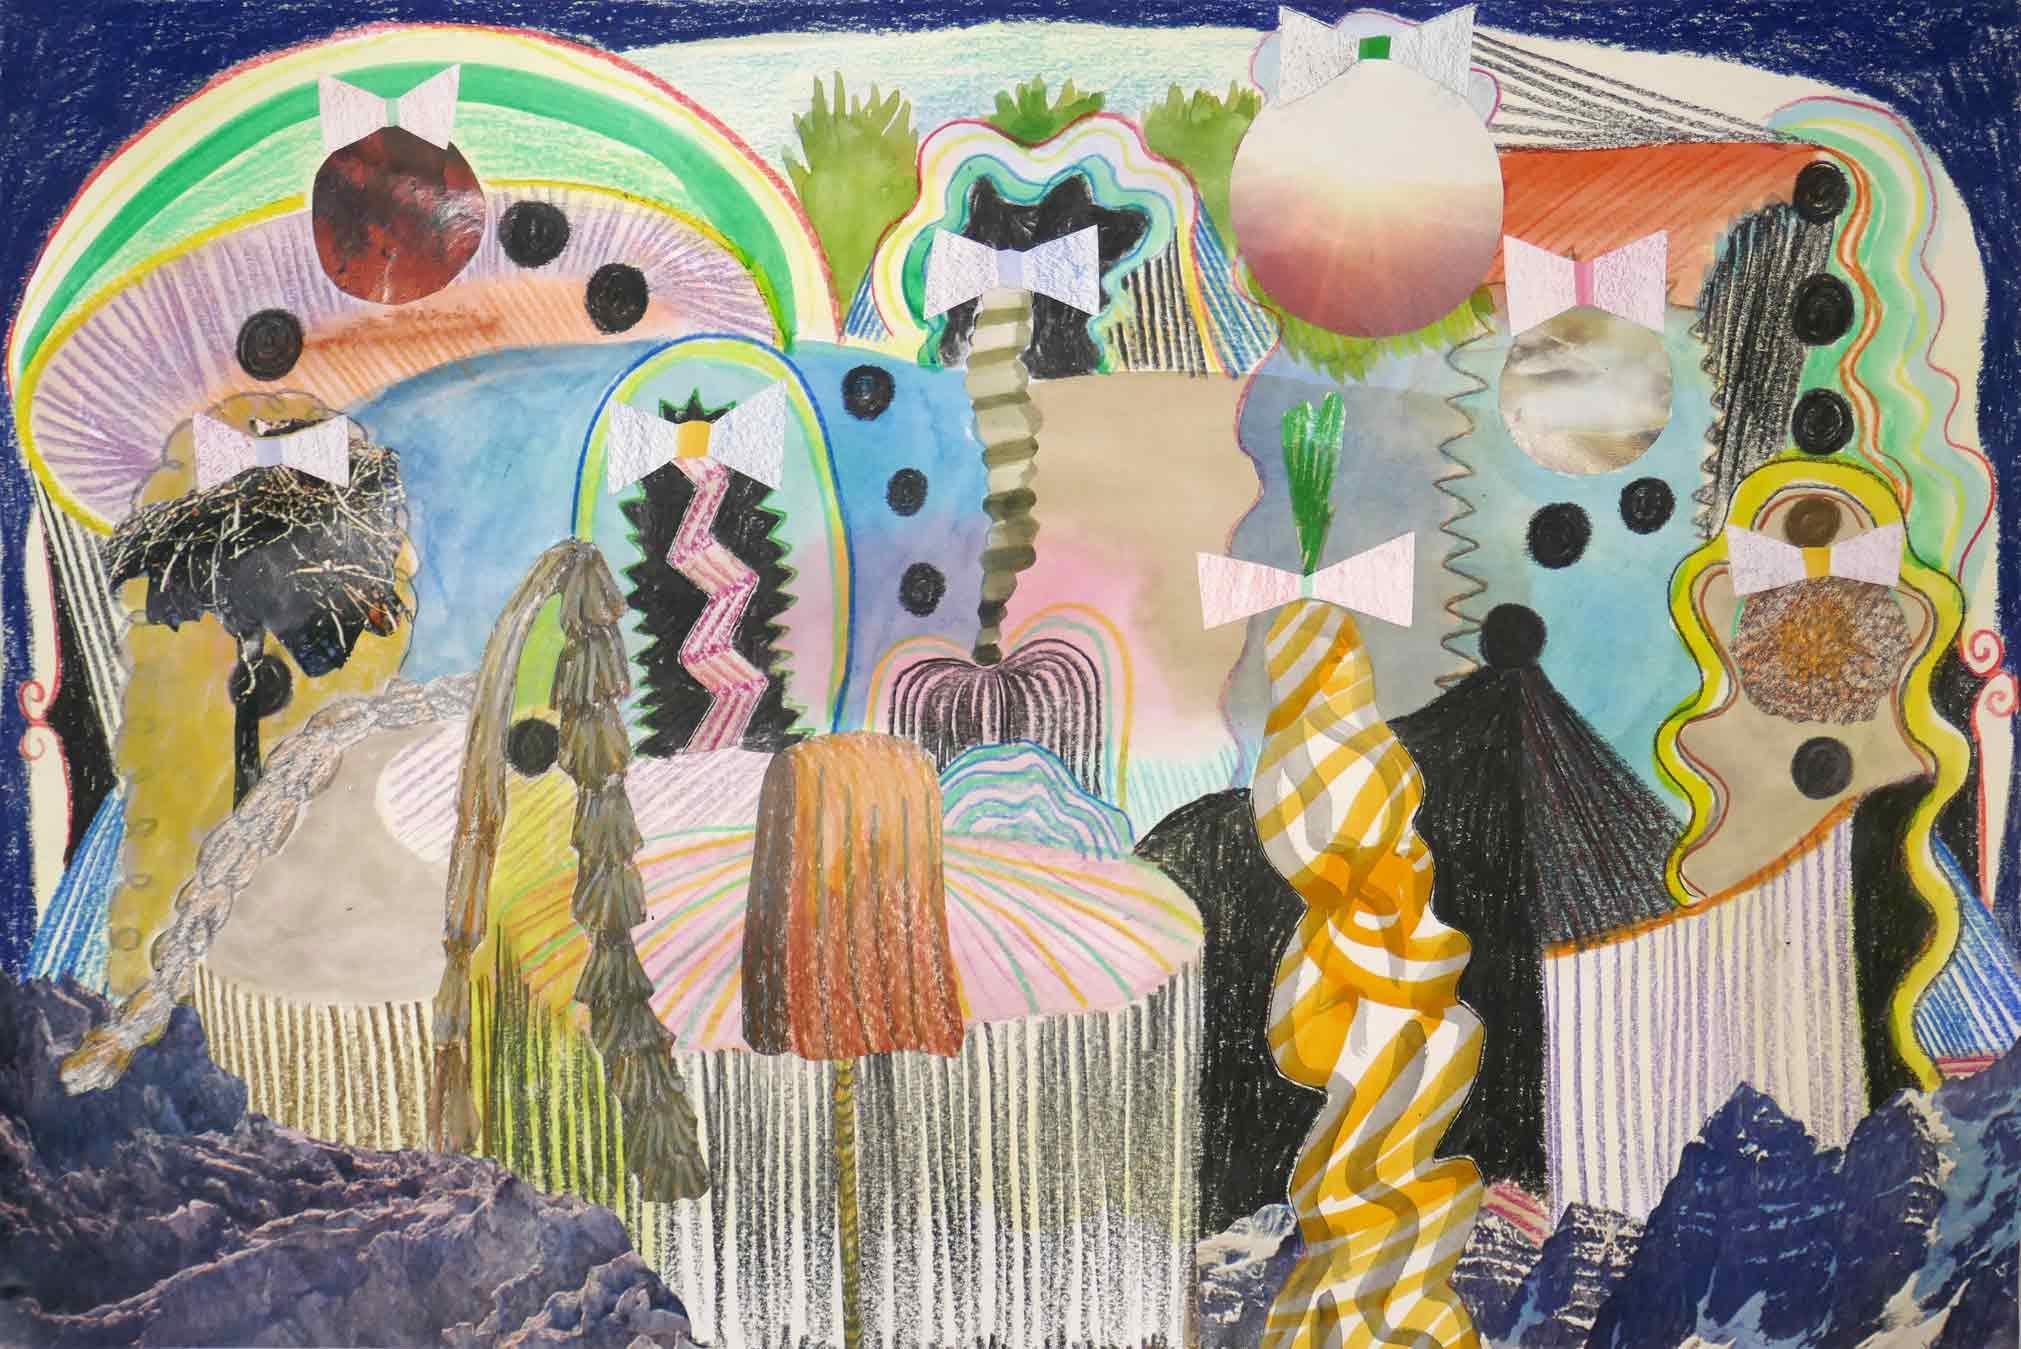 Uit de serie  Endings and beginnings  collage; foto's, inkt, potlood, aquarel 26 x 40 cm, 2018